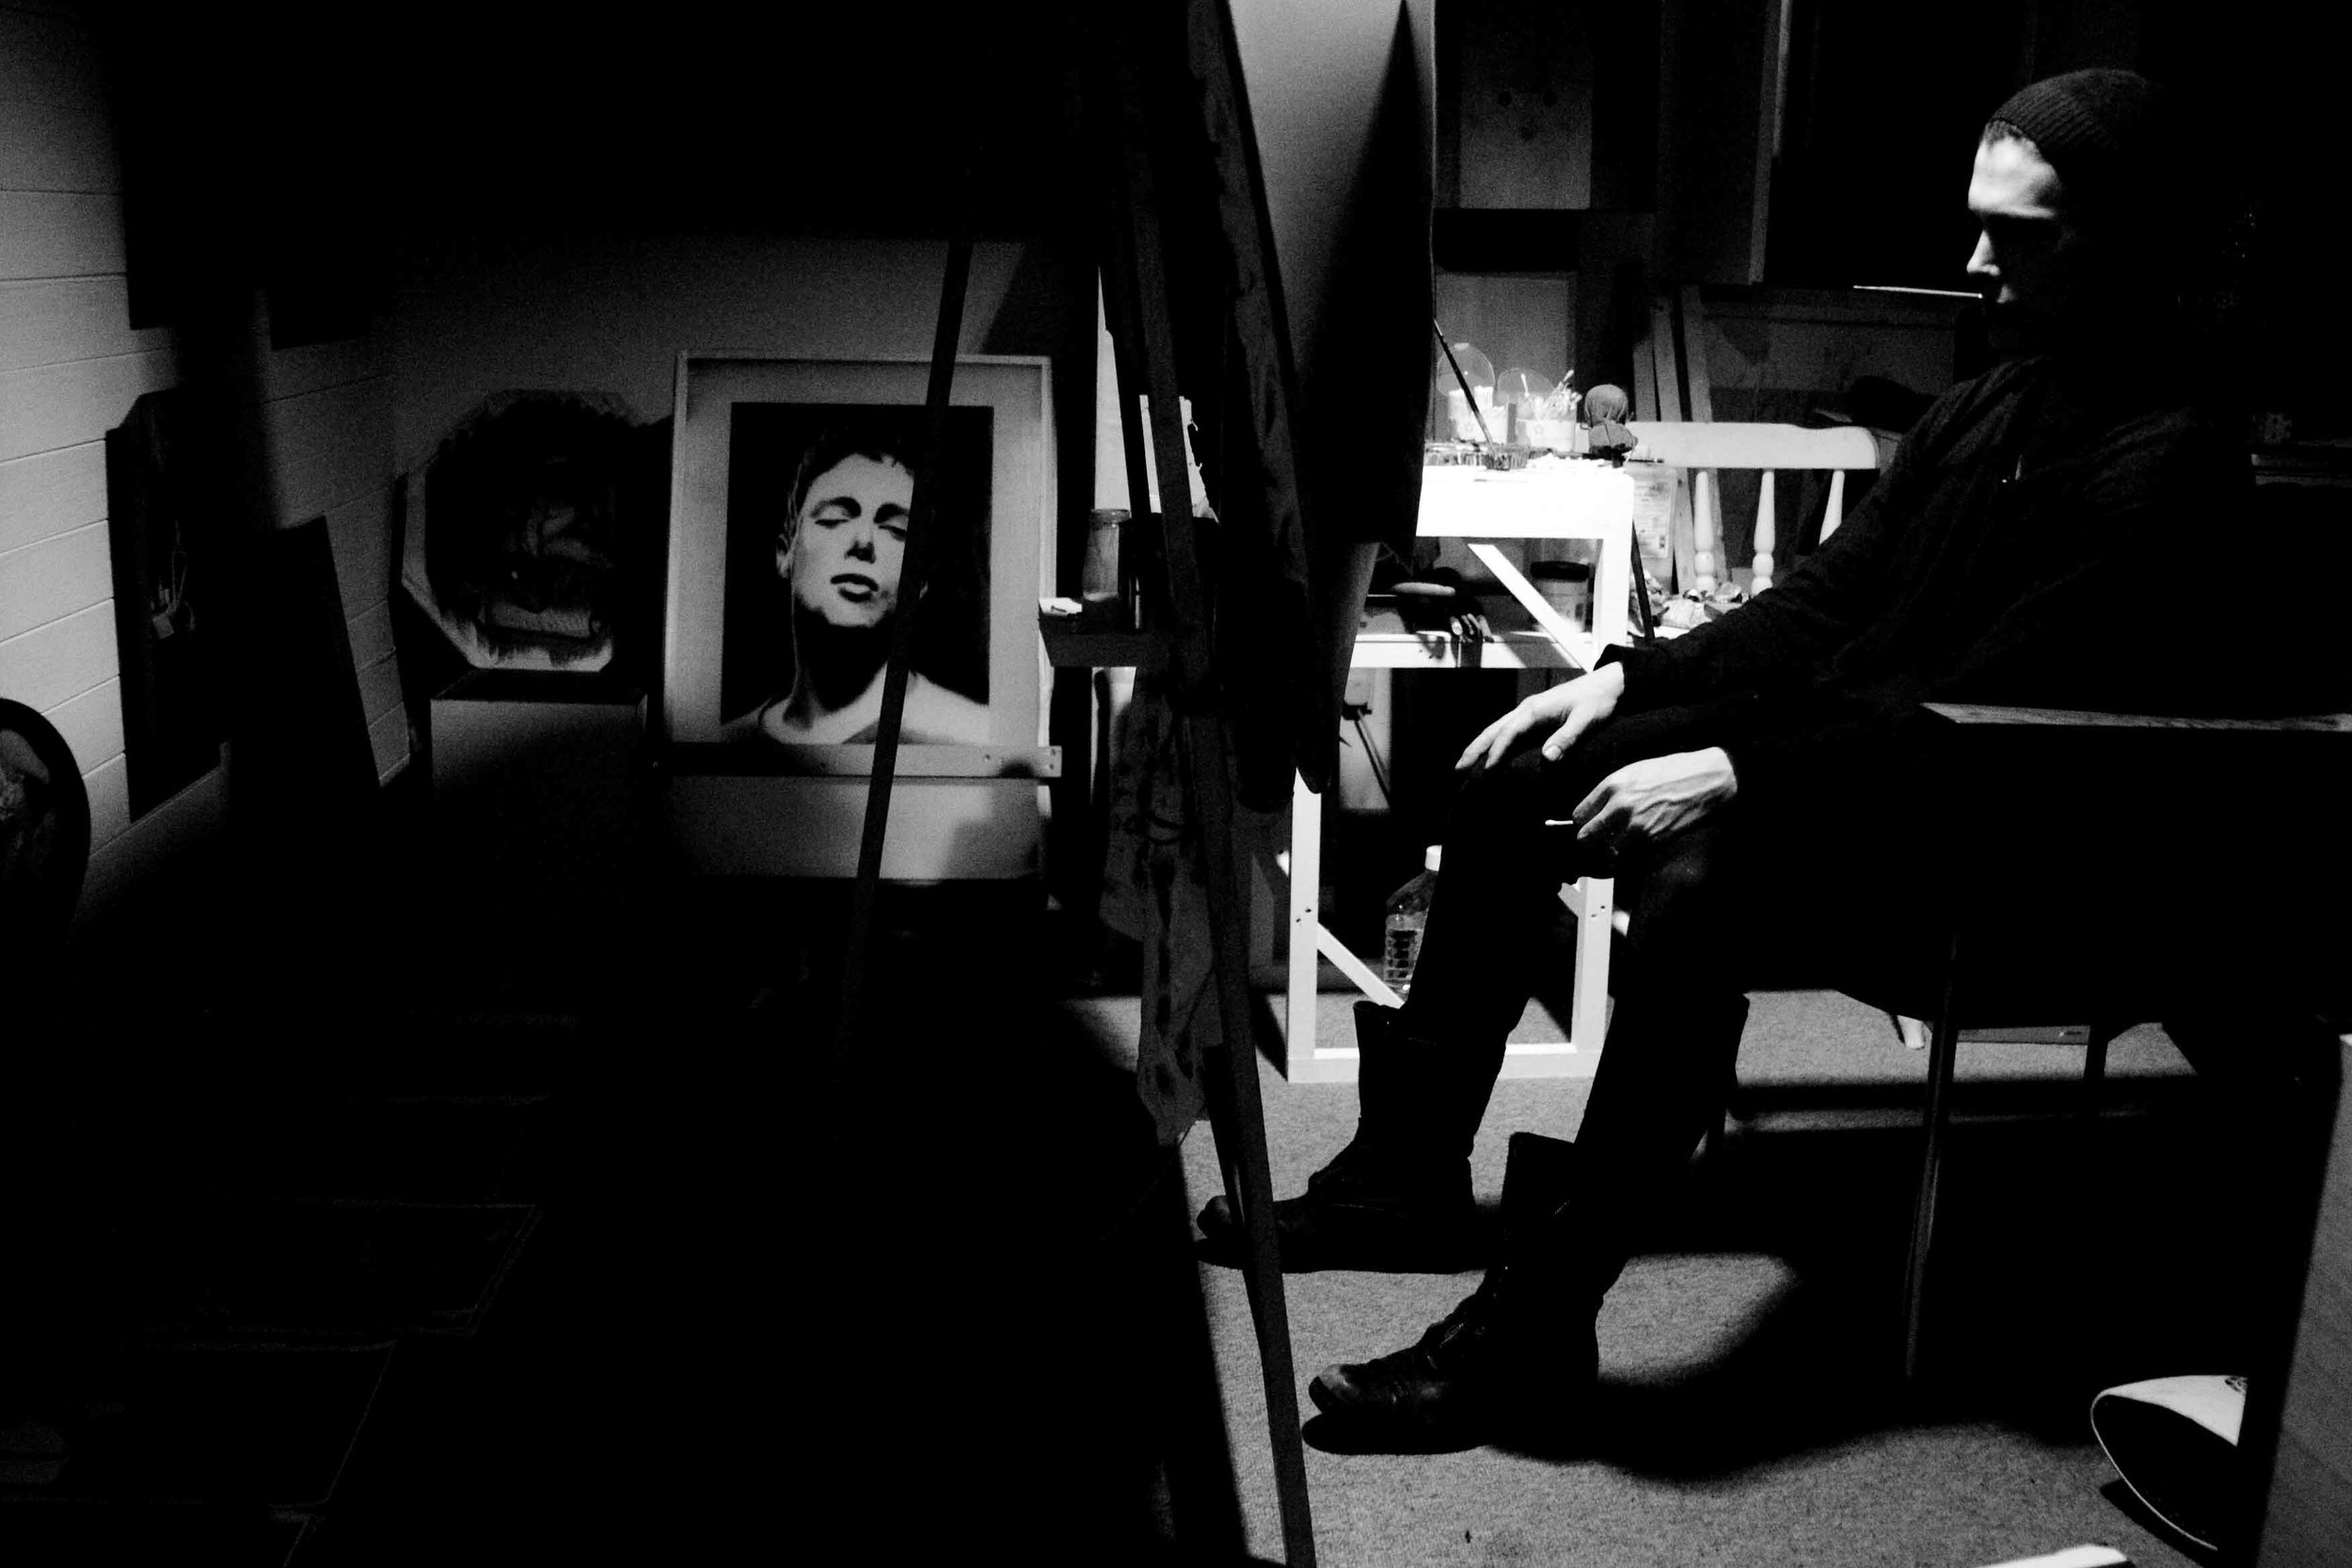 ben ashton // bloomsbury studio // fiona garden 2010